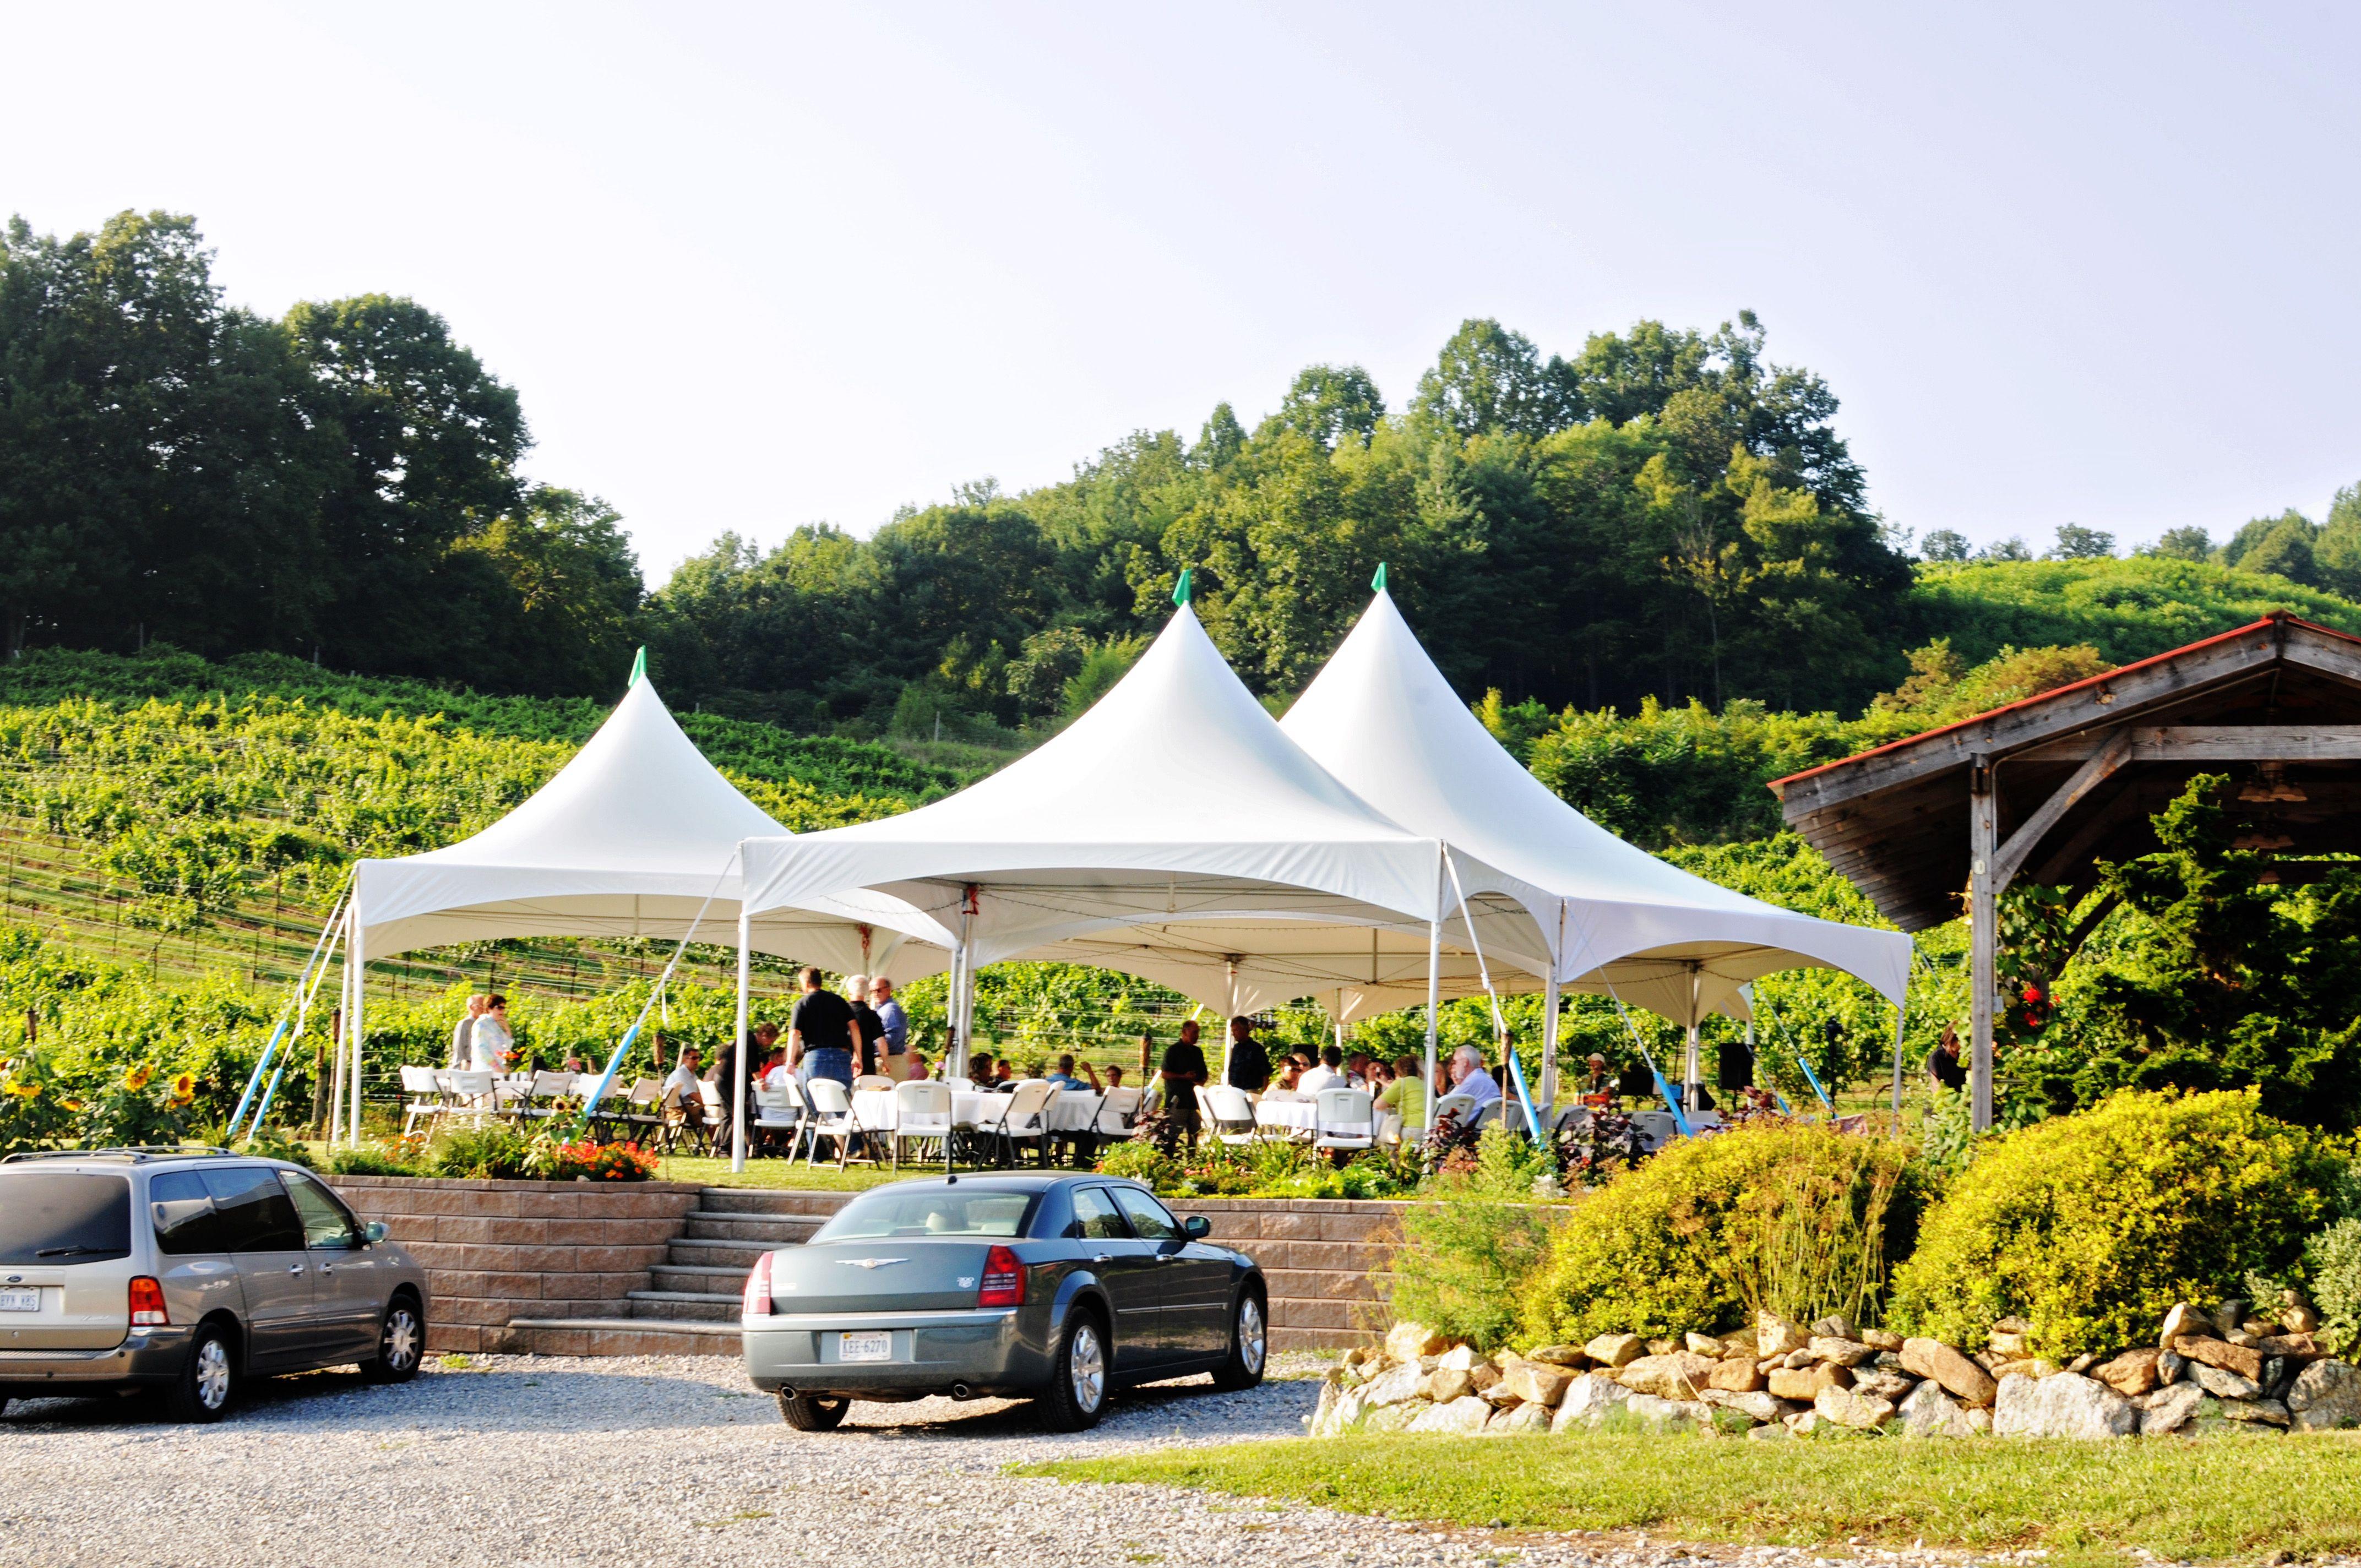 AmRheinu0027s Wine Cellars & AmRheinu0027s Wine Cellars | Wedding Ideas | Pinterest | Wine cellars ...